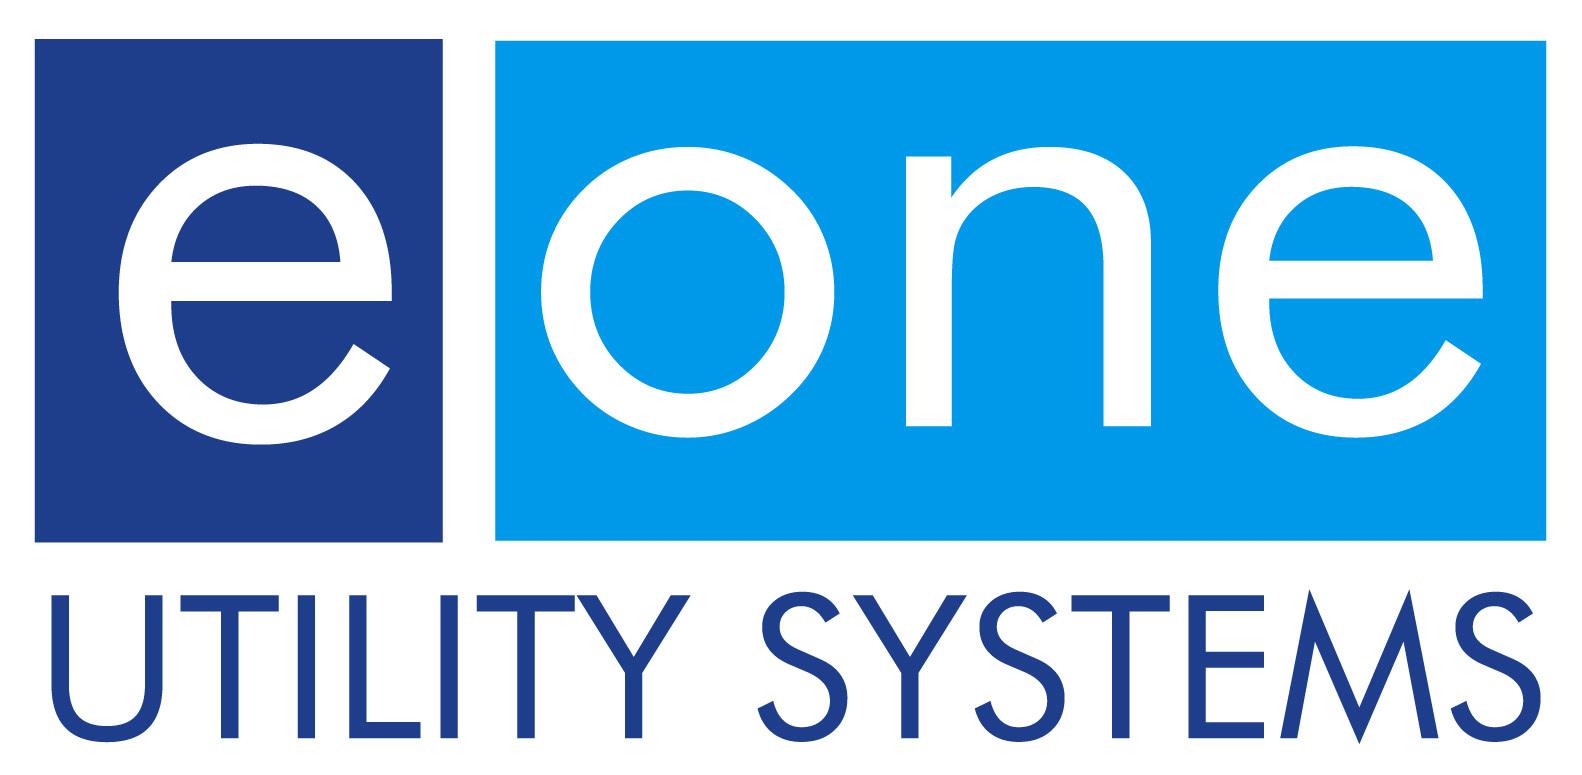 Environment+One+Corporation+logos